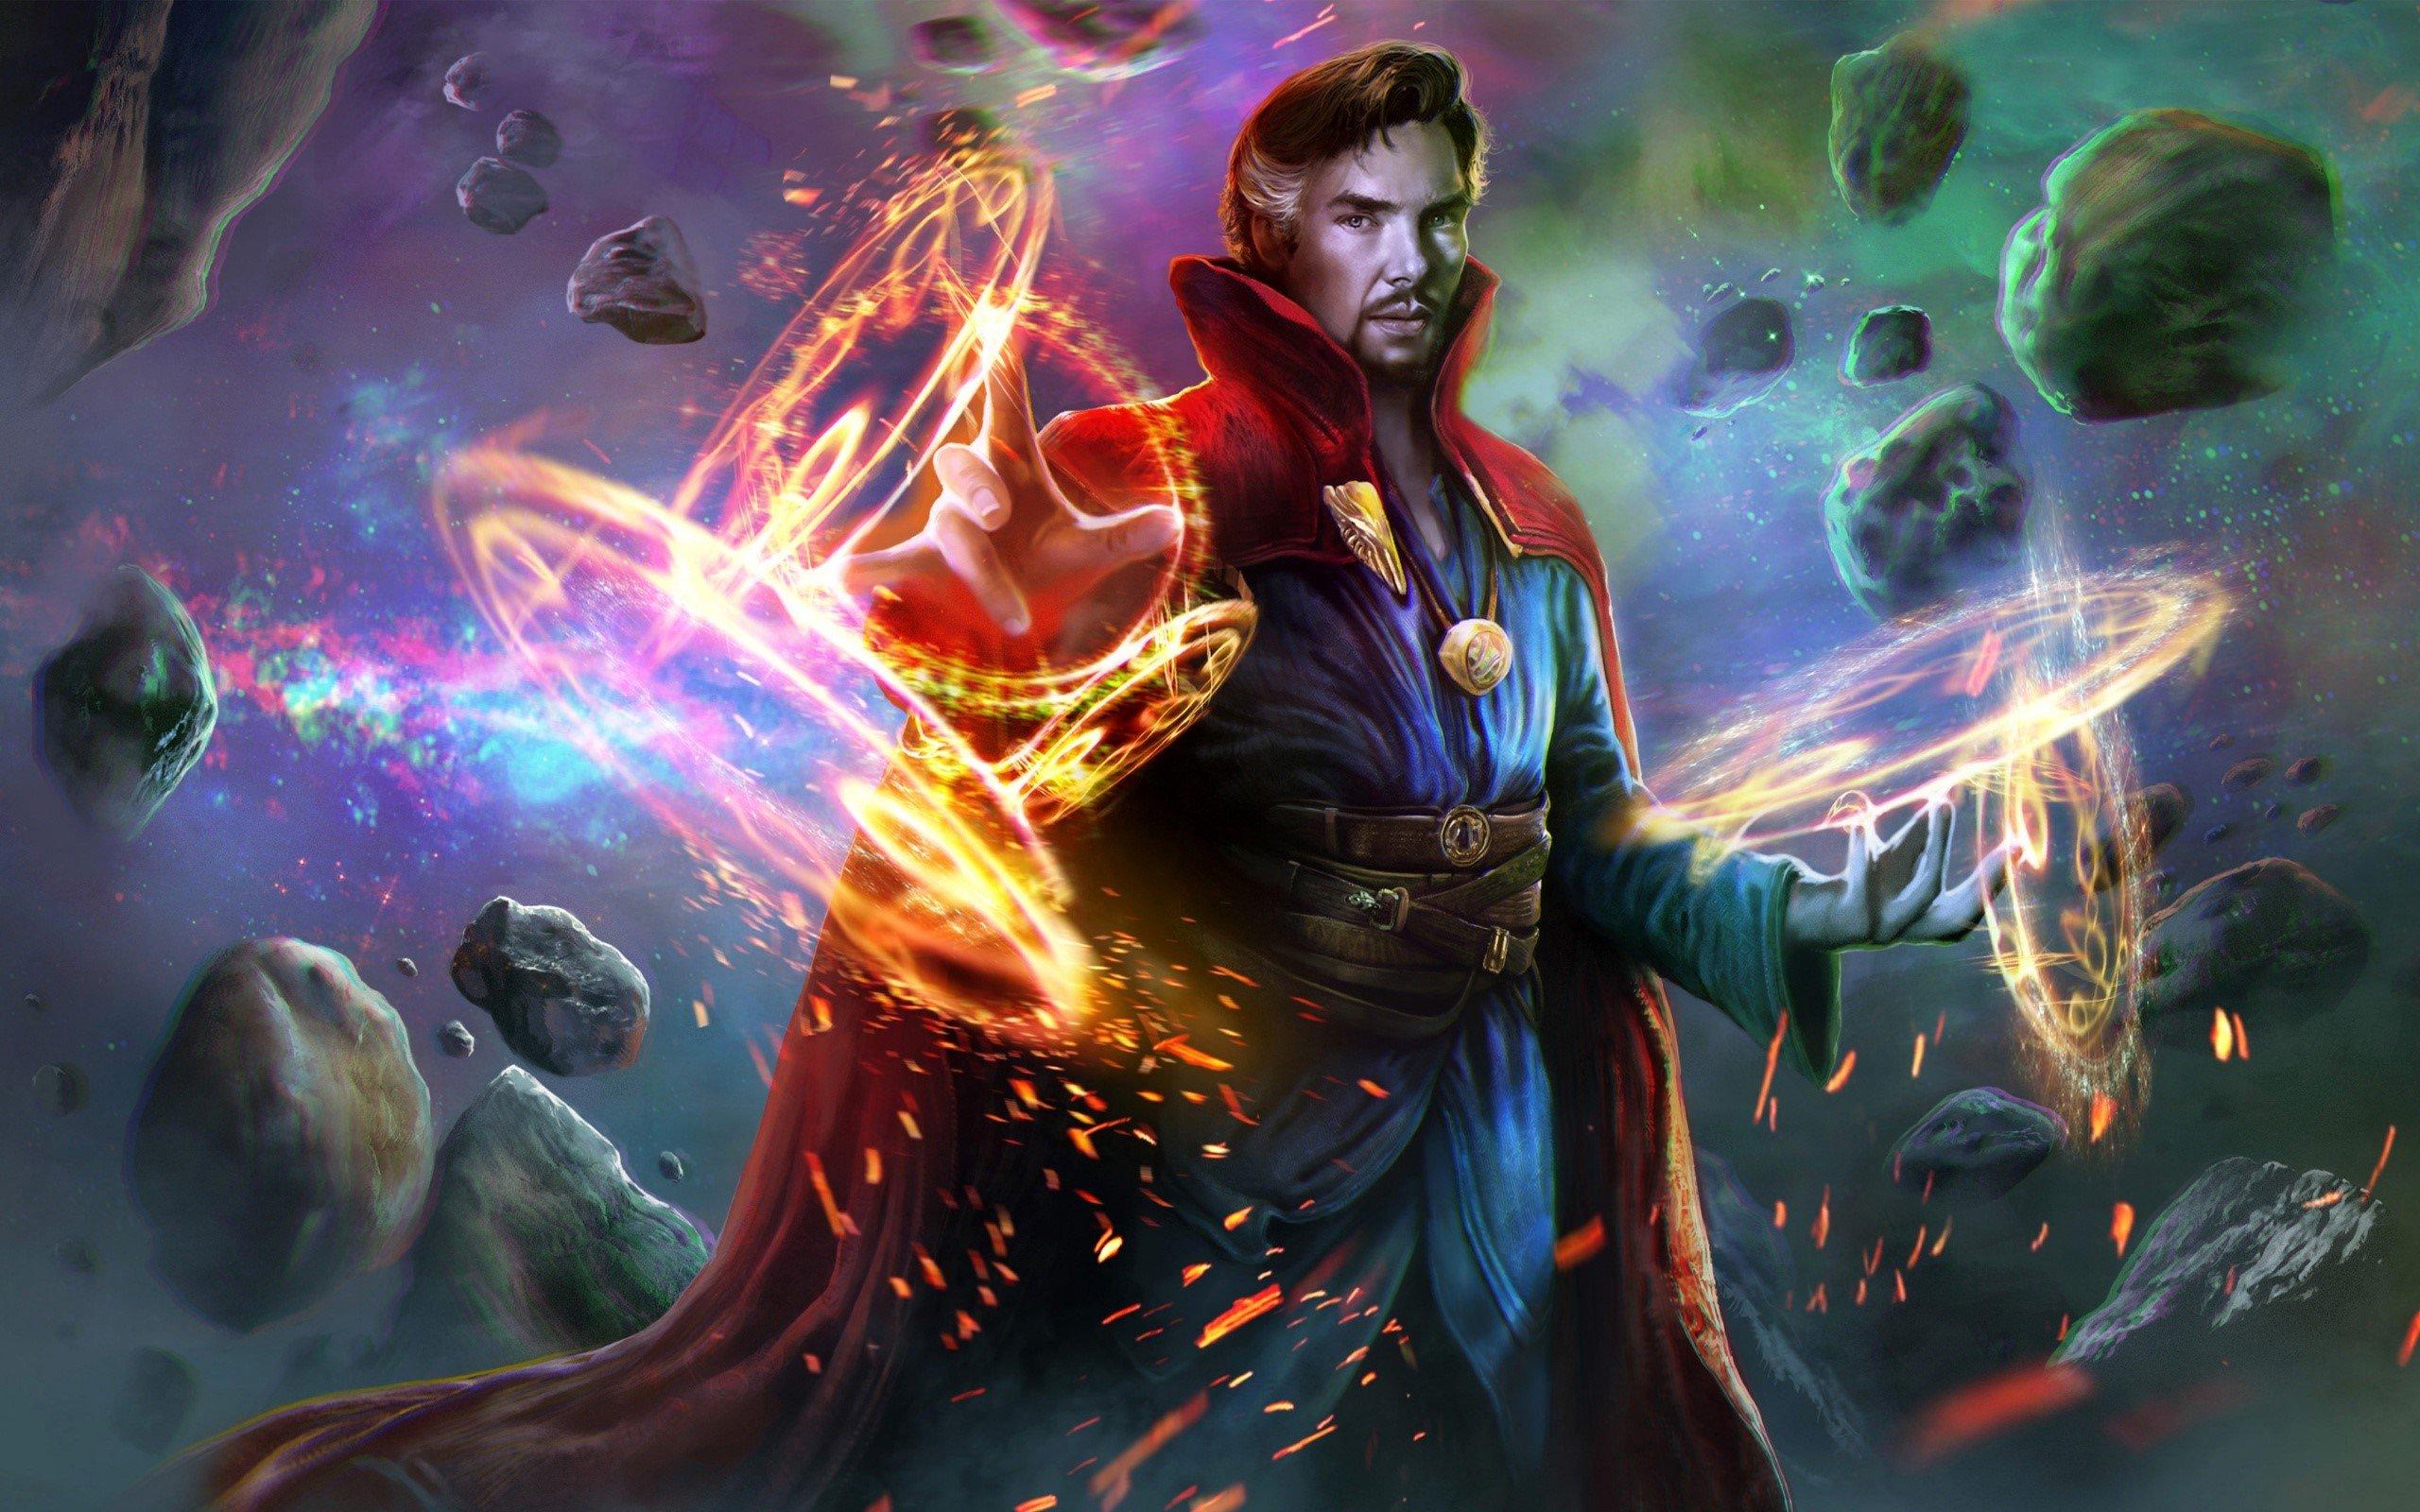 Fondo de pantalla de Fan art de Doctor Strange Imágenes